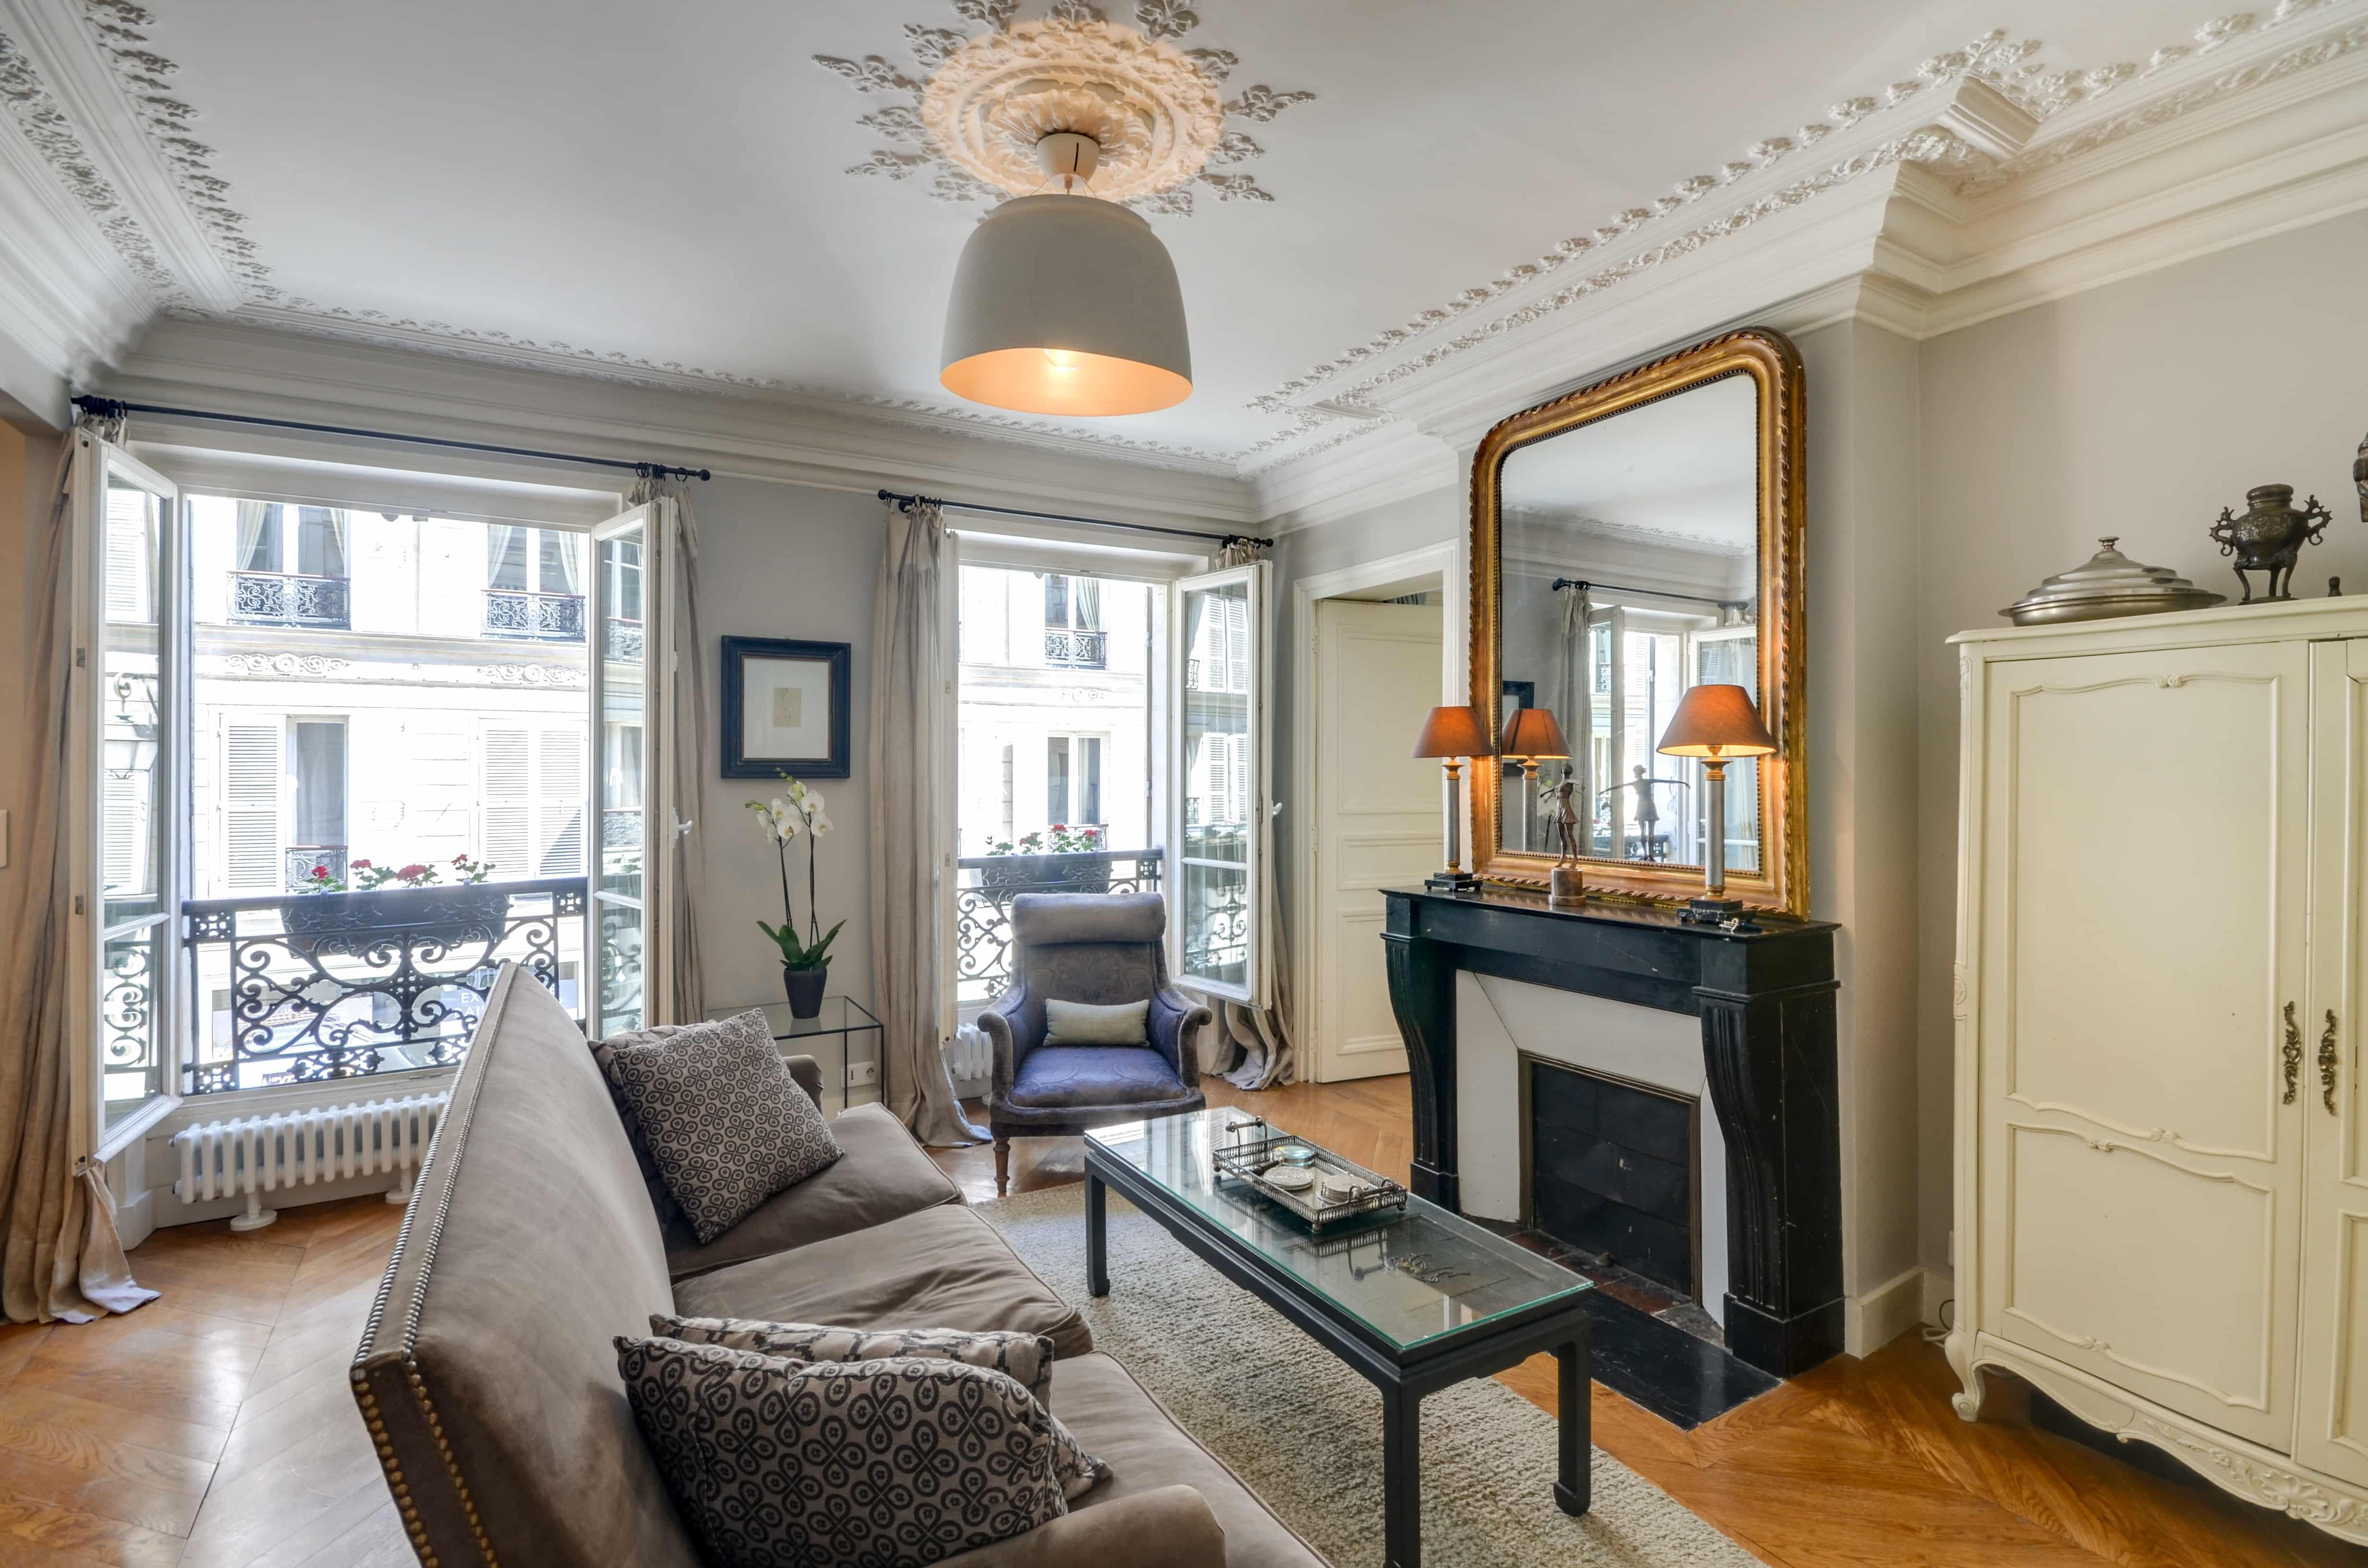 Malher — Paris Property Group